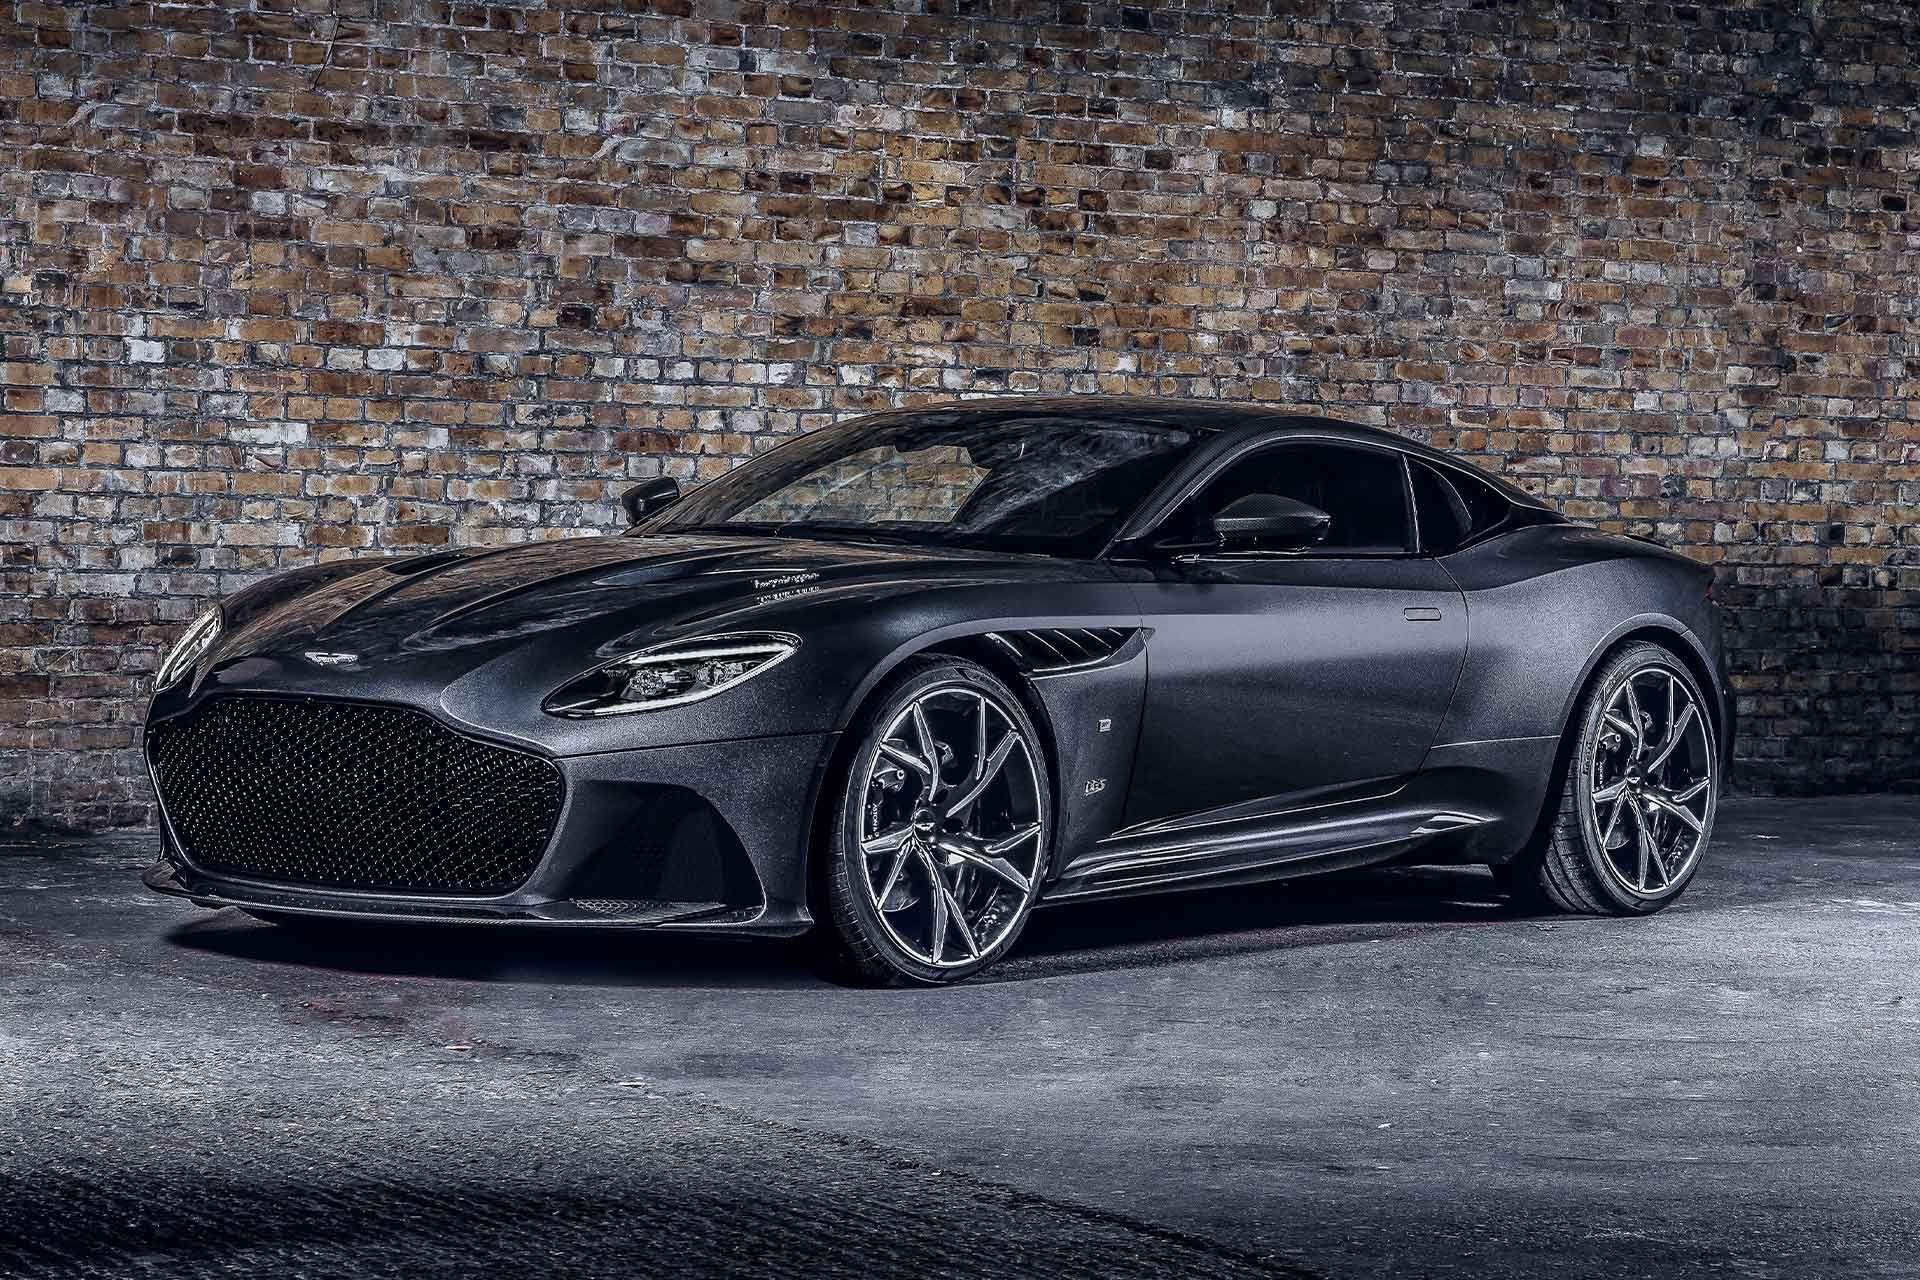 Aston Martin 007 Edition Sports Cars In 2020 Aston Martin Dbs Superleggera Aston Martin